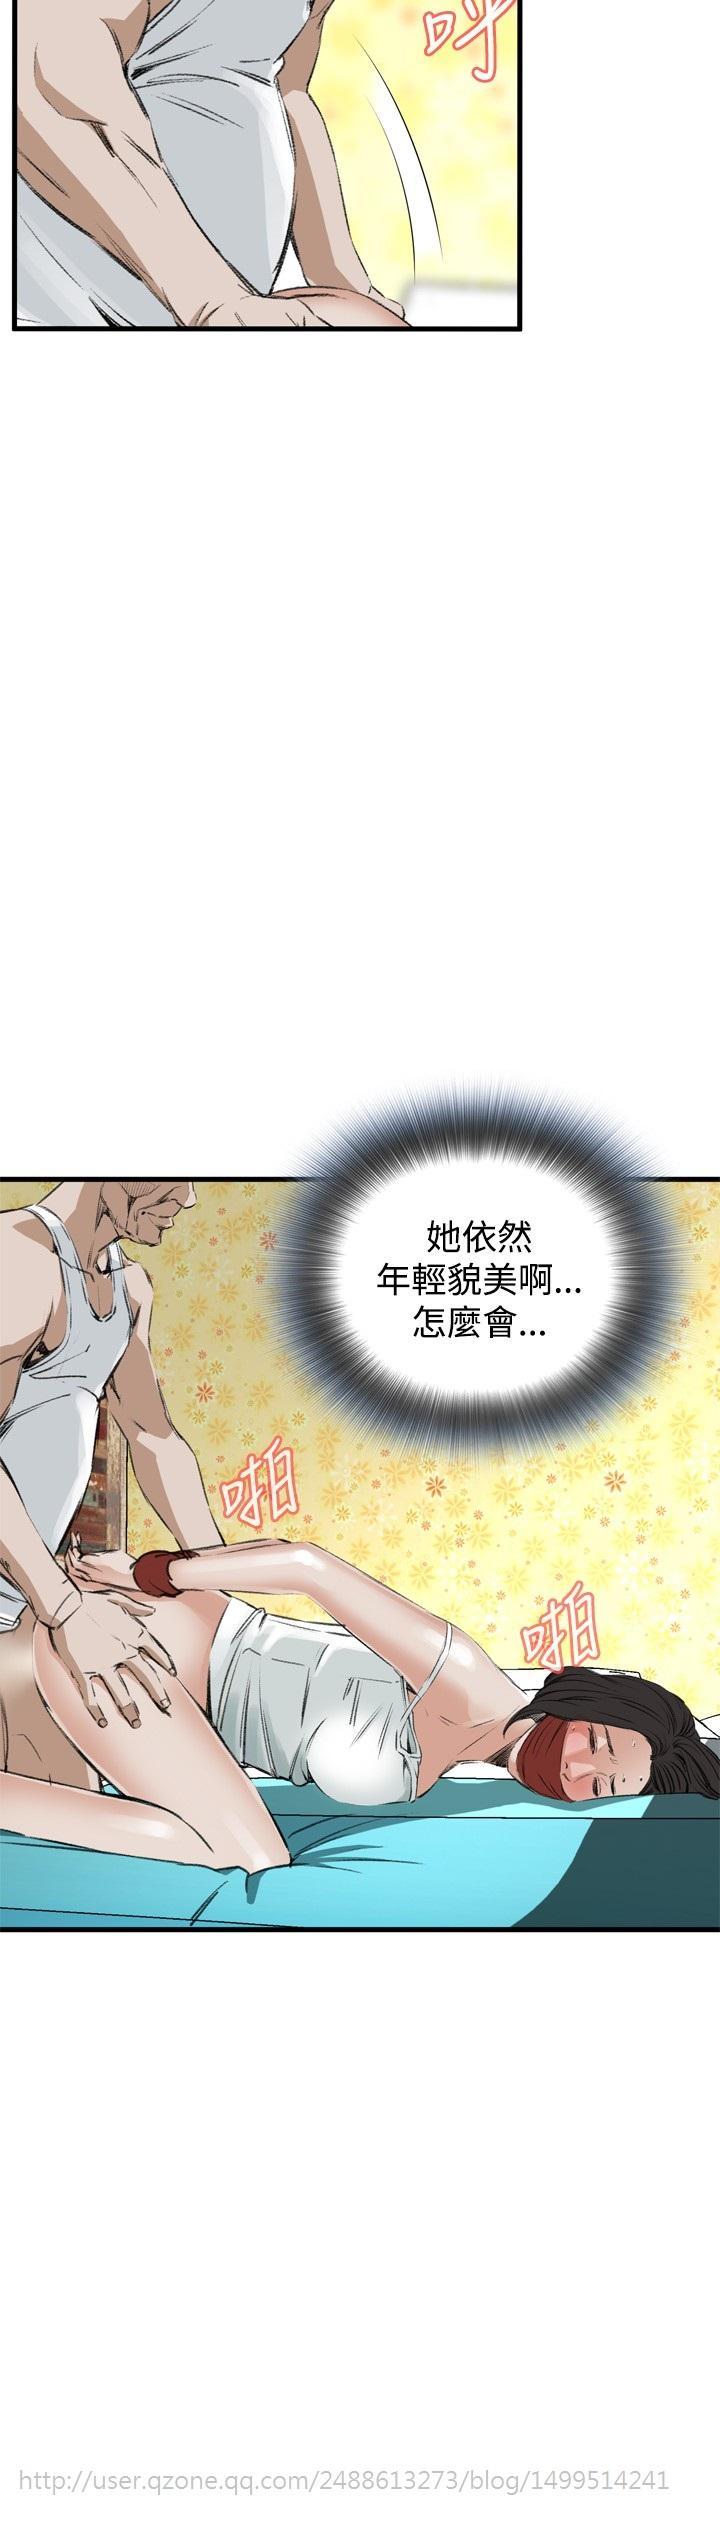 Take a Peek 偷窥 Ch.39~51 [Chinese]中文 162